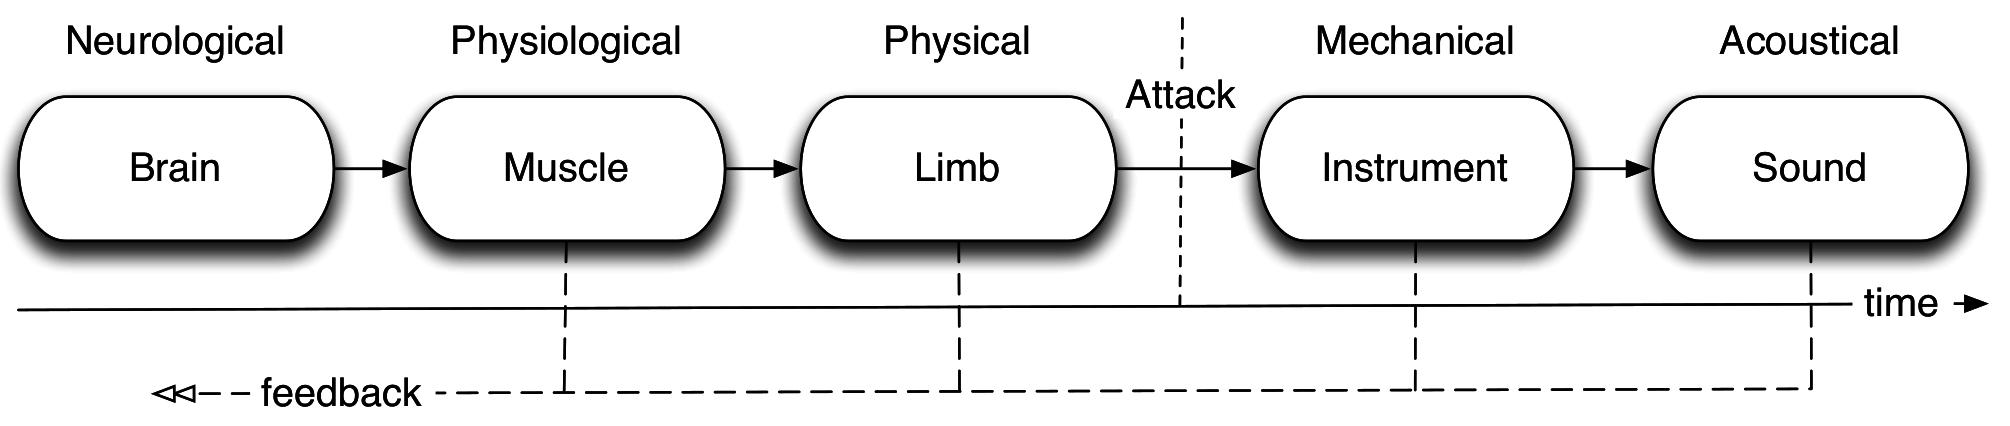 Action-sound chain